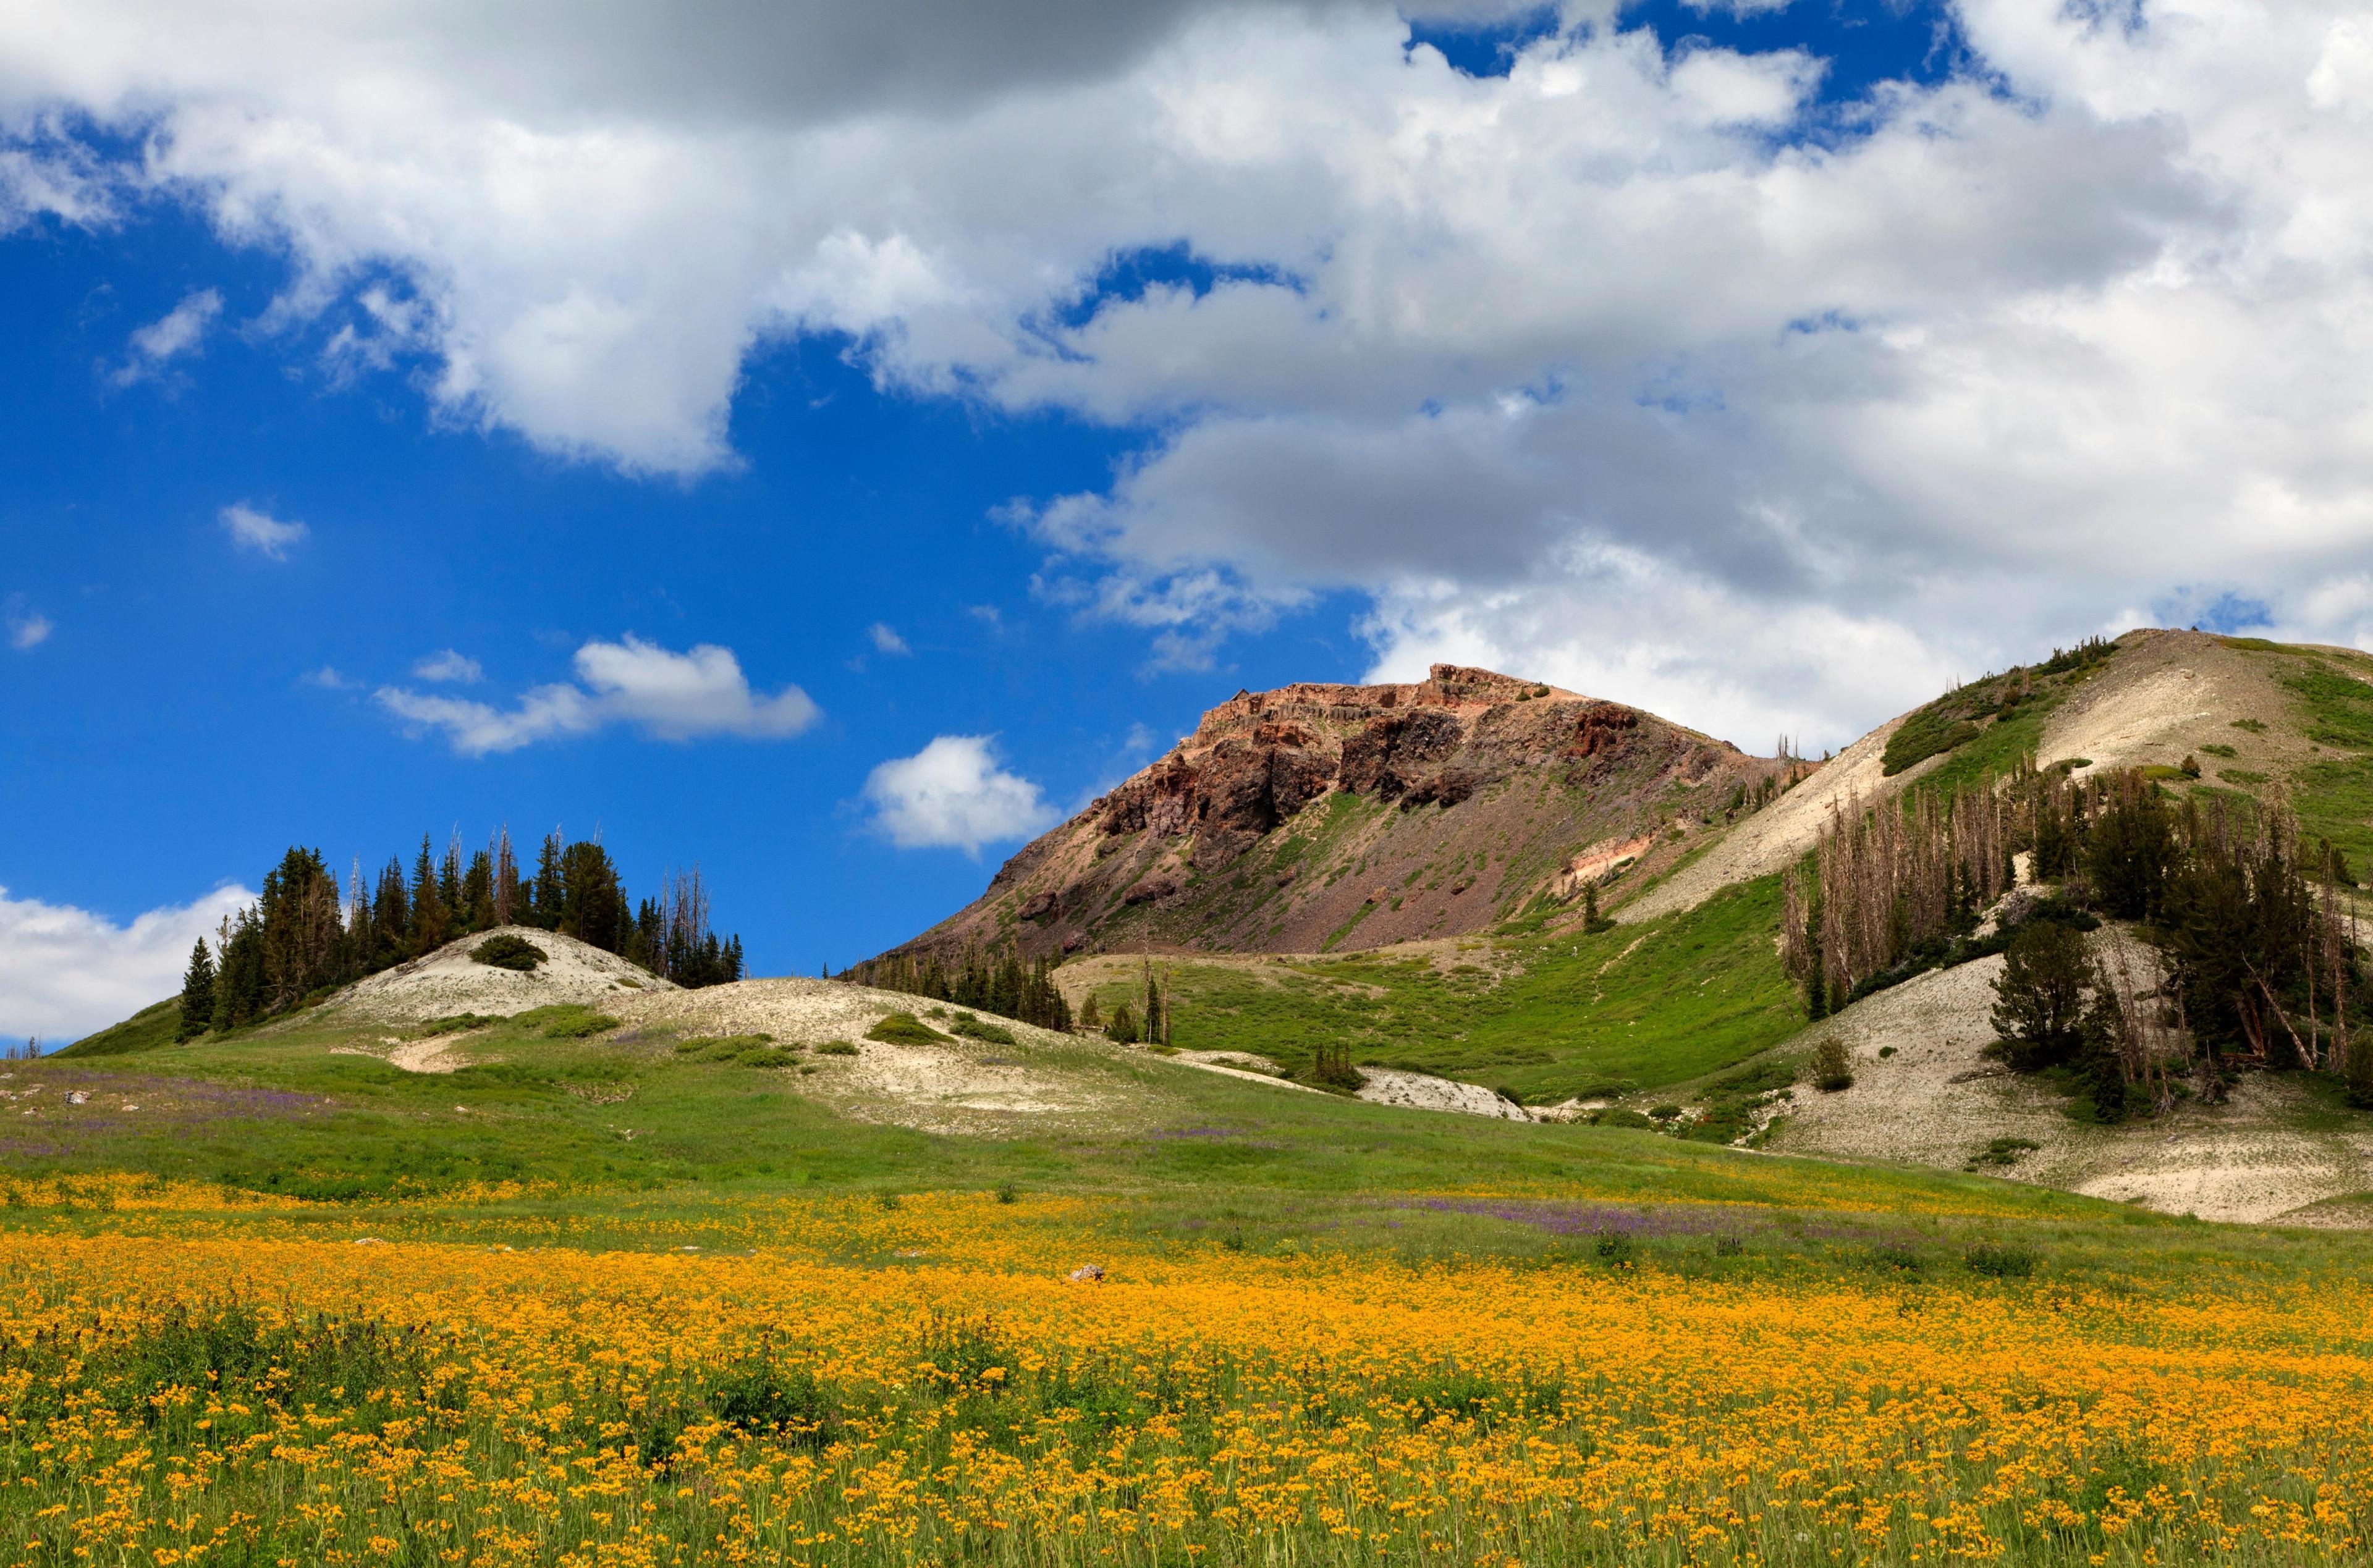 Steam Engine Meadows, Brian Head, Utah, United States of America